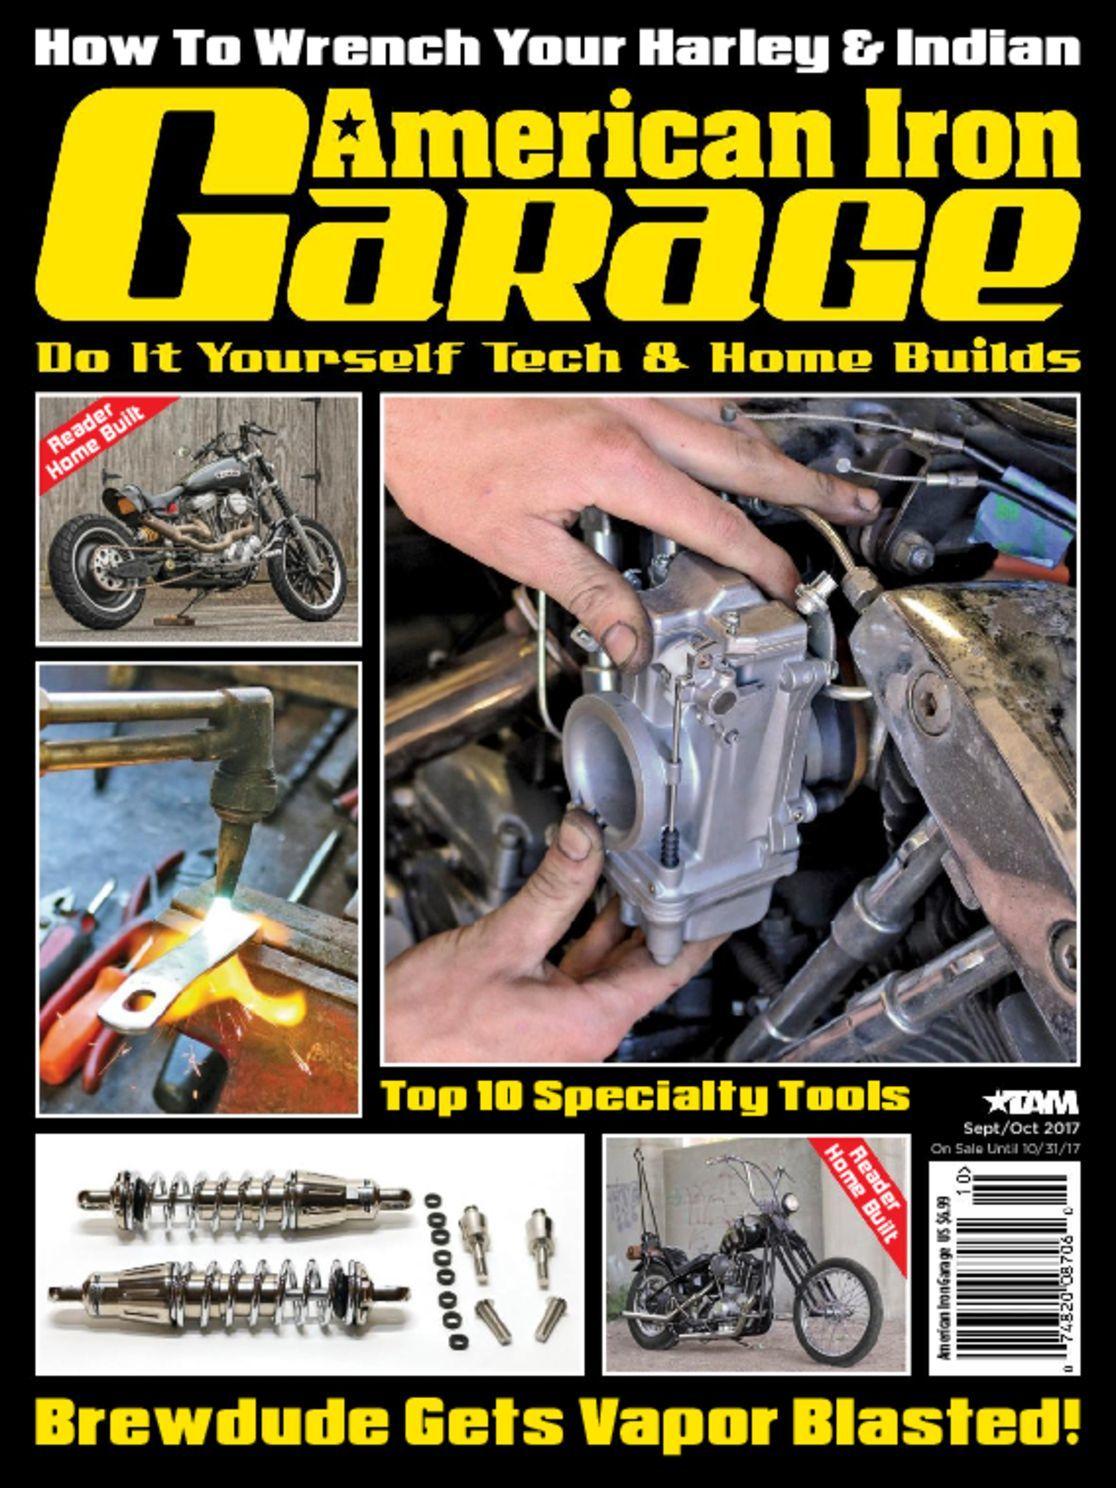 American iron garage magazine digital discountmags